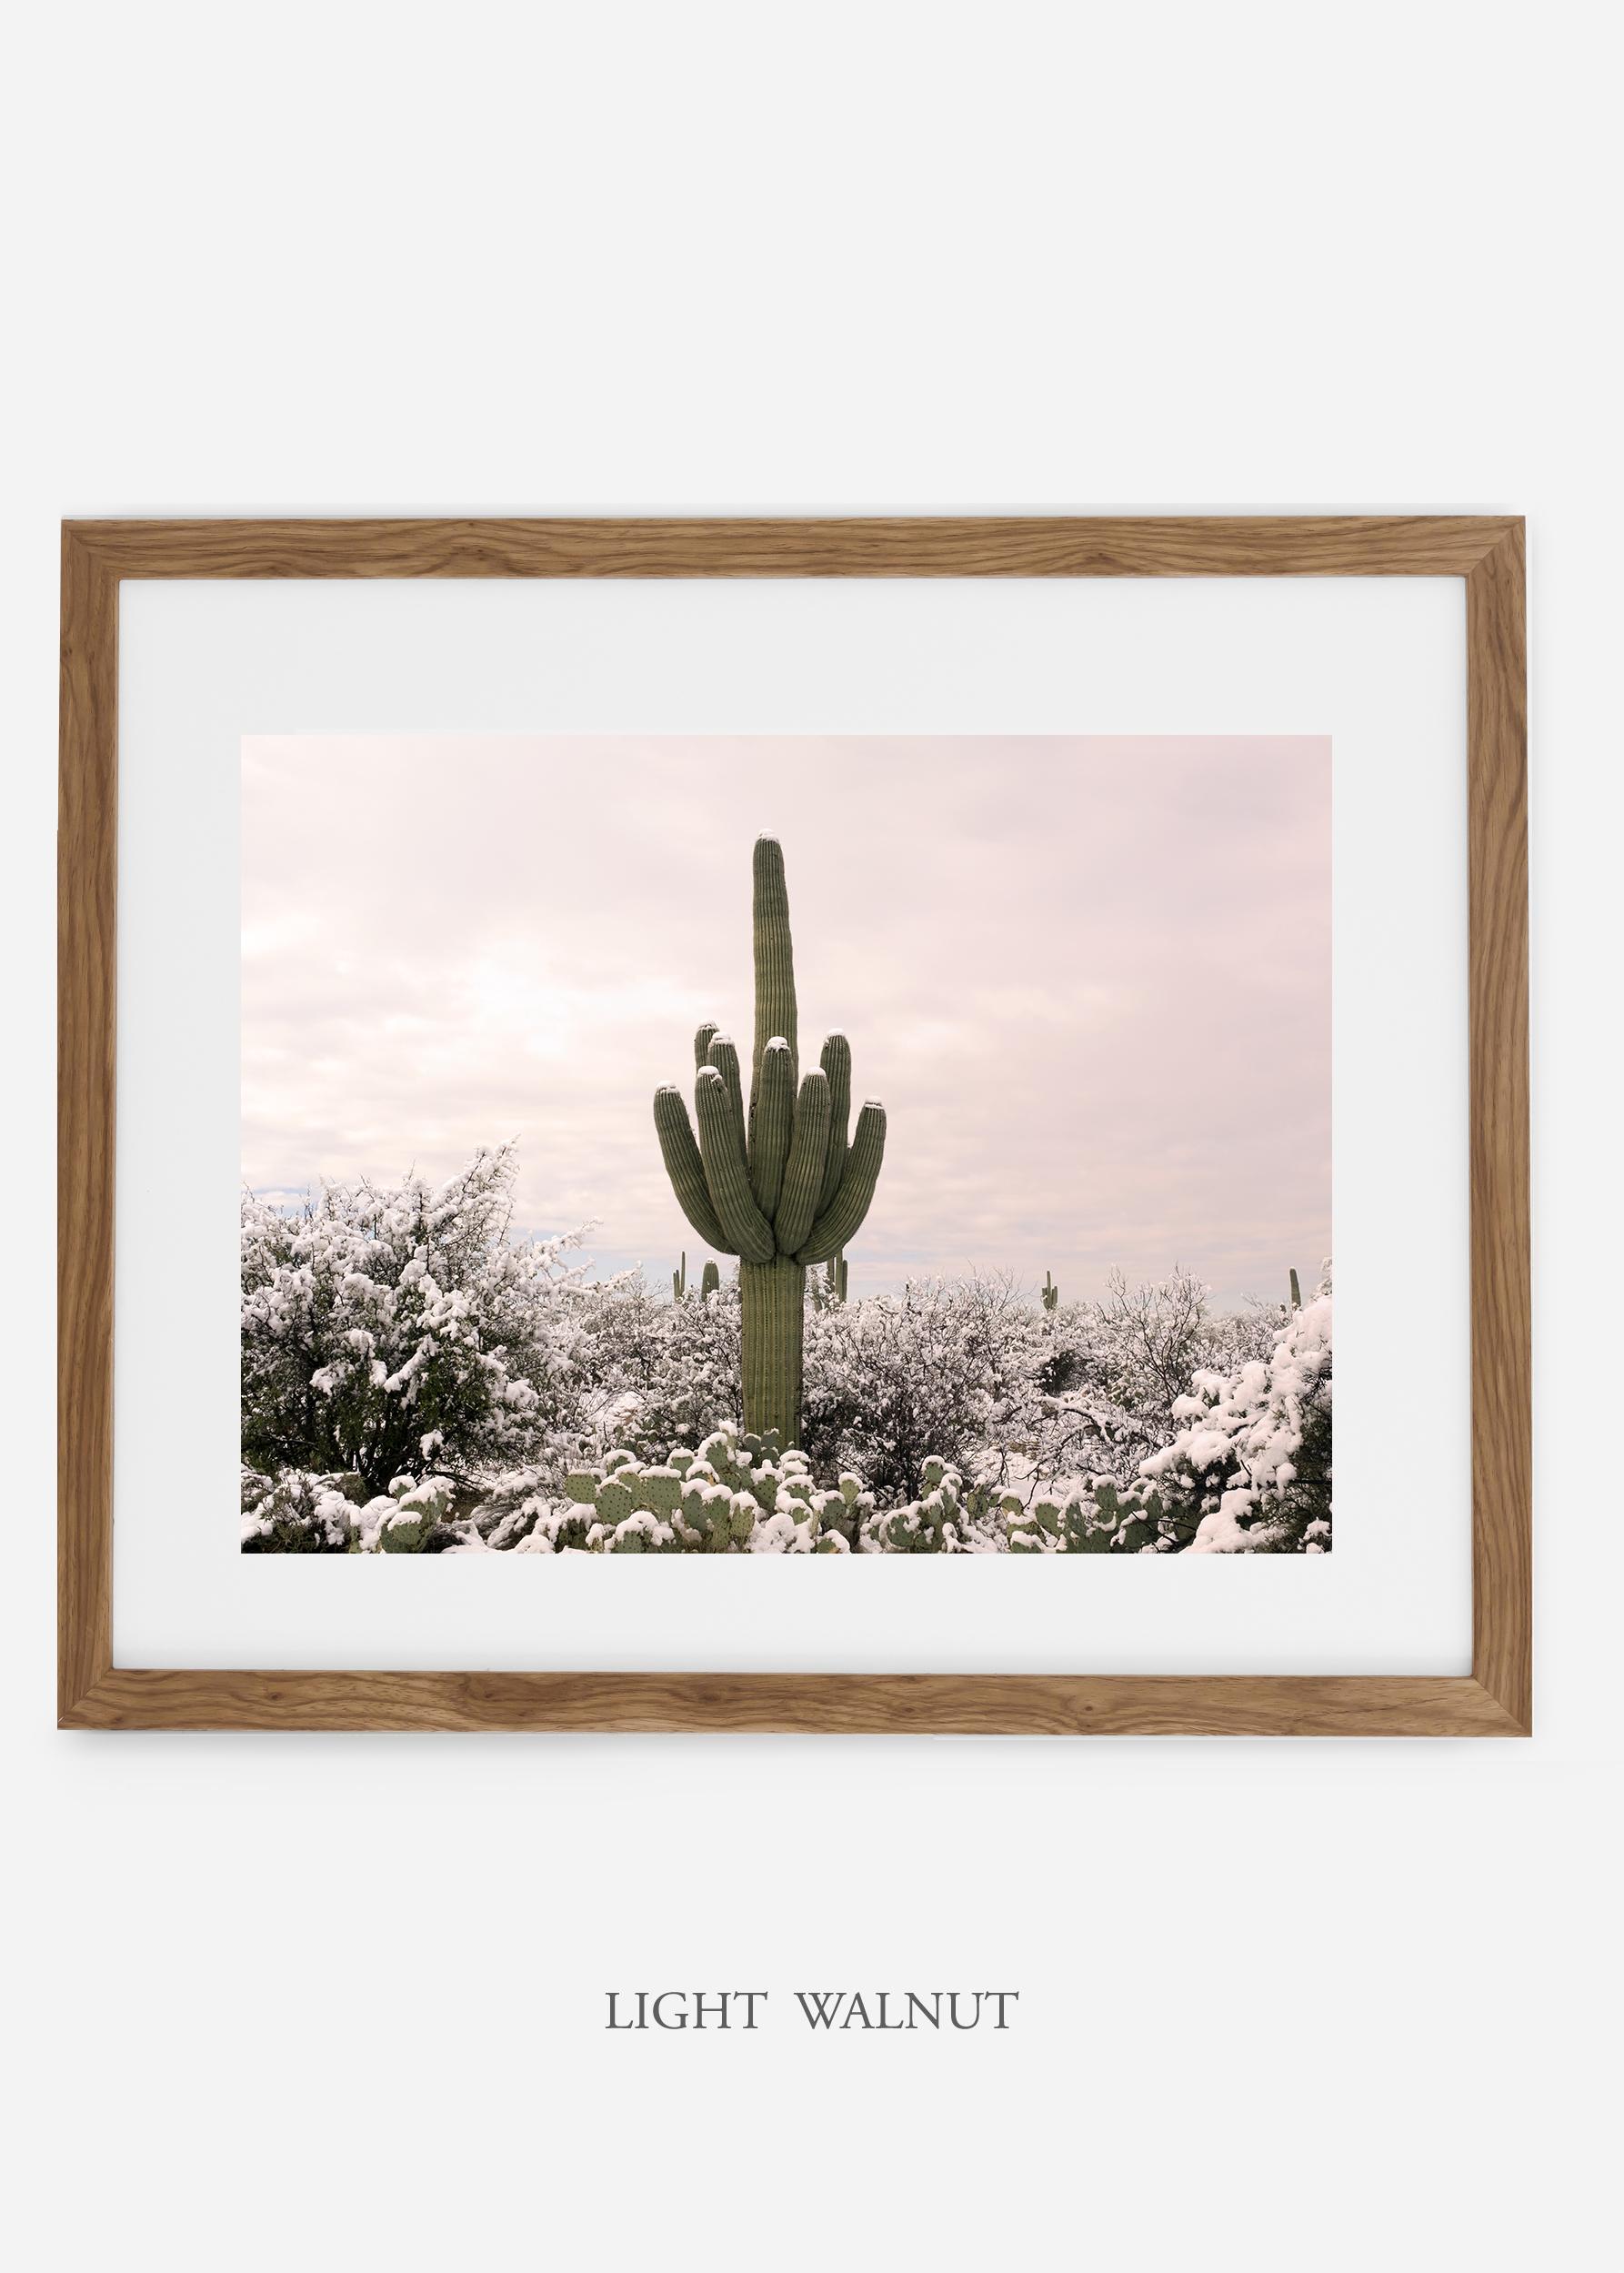 lightwalnutframe-saguaroNo.3-wildercalifornia-art-wallart-cactusprint-homedecor-prints-arizona-botanical-artwork-interiordesign.jpg